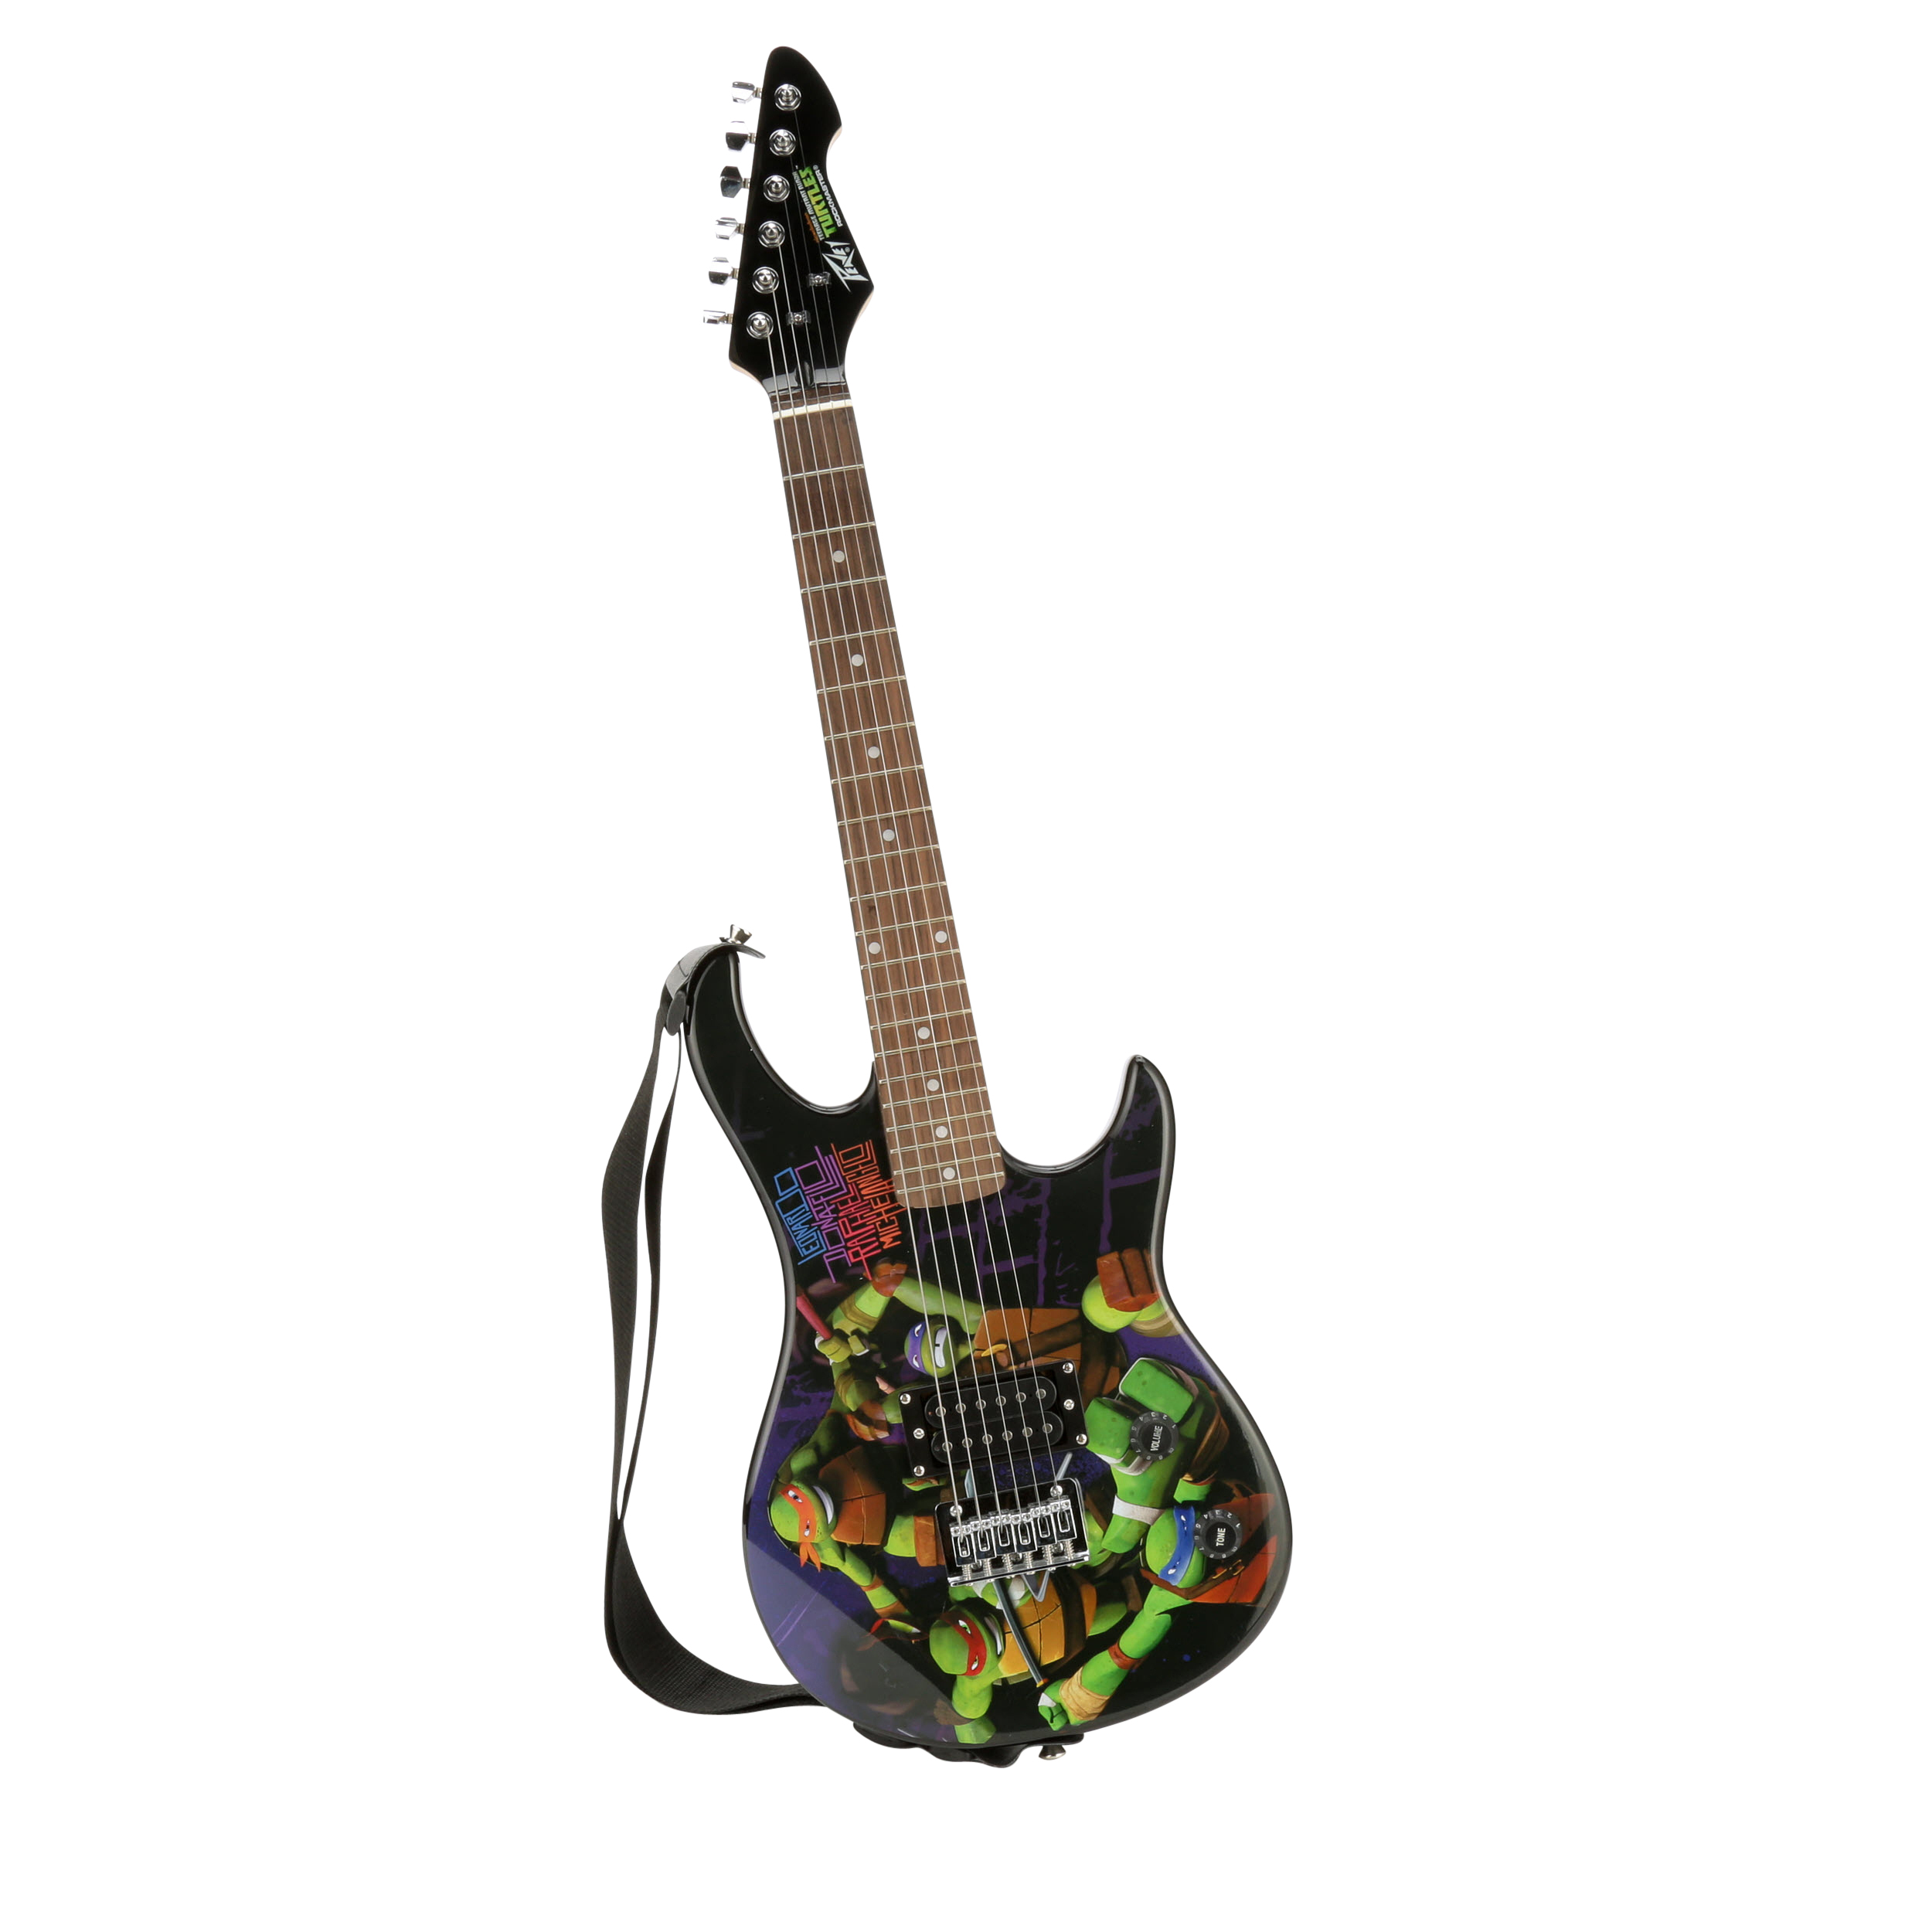 Click here to buy Peavey Nickelodeon Teenage Mutant Ninja Turtles 3 4 Size Electric Rockmaster Guitar by Peavy.